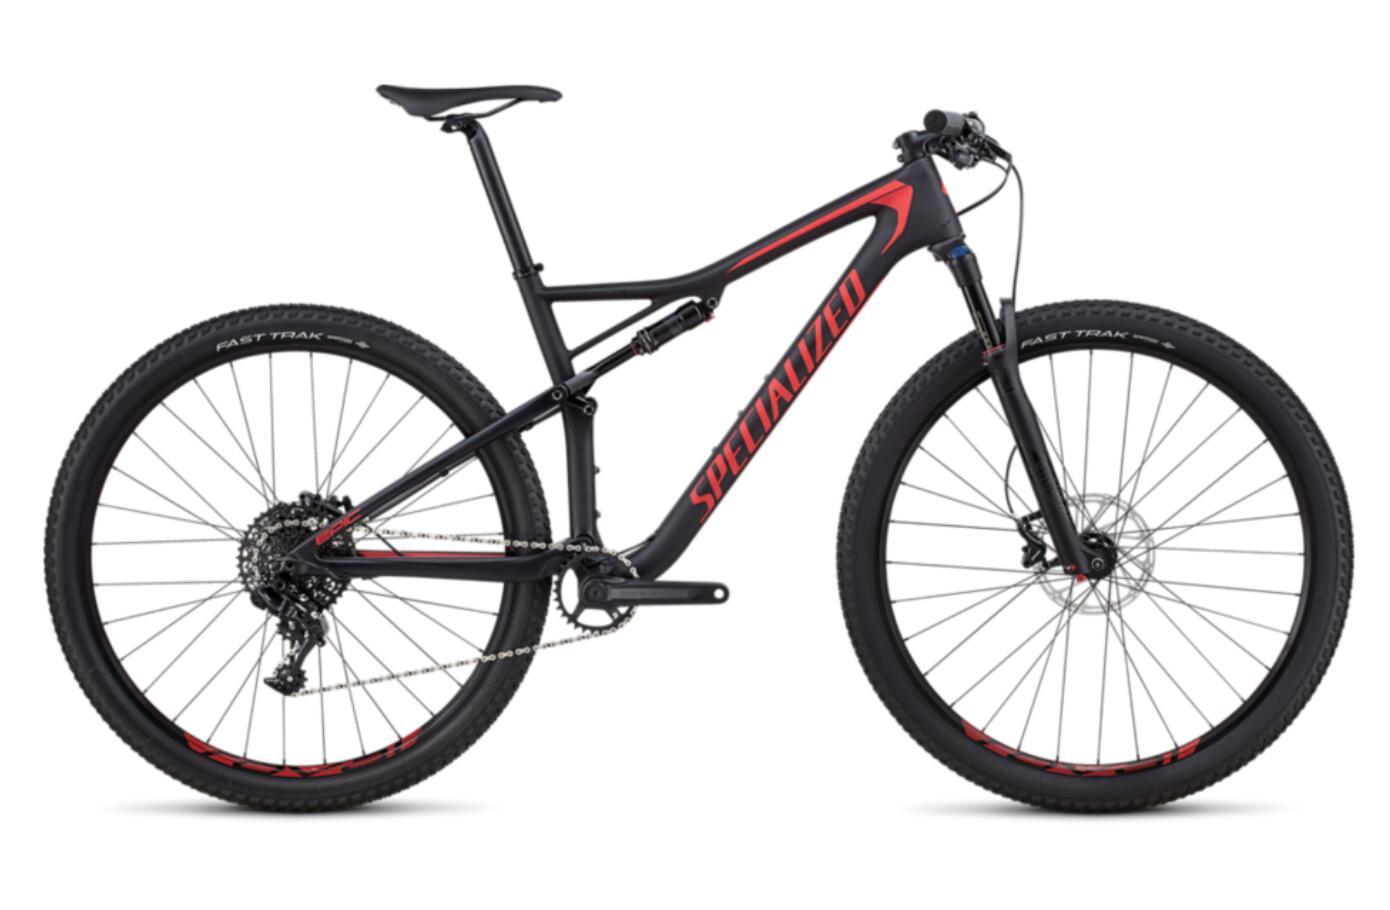 2018 Epic Comp Carbon Mountain Bike